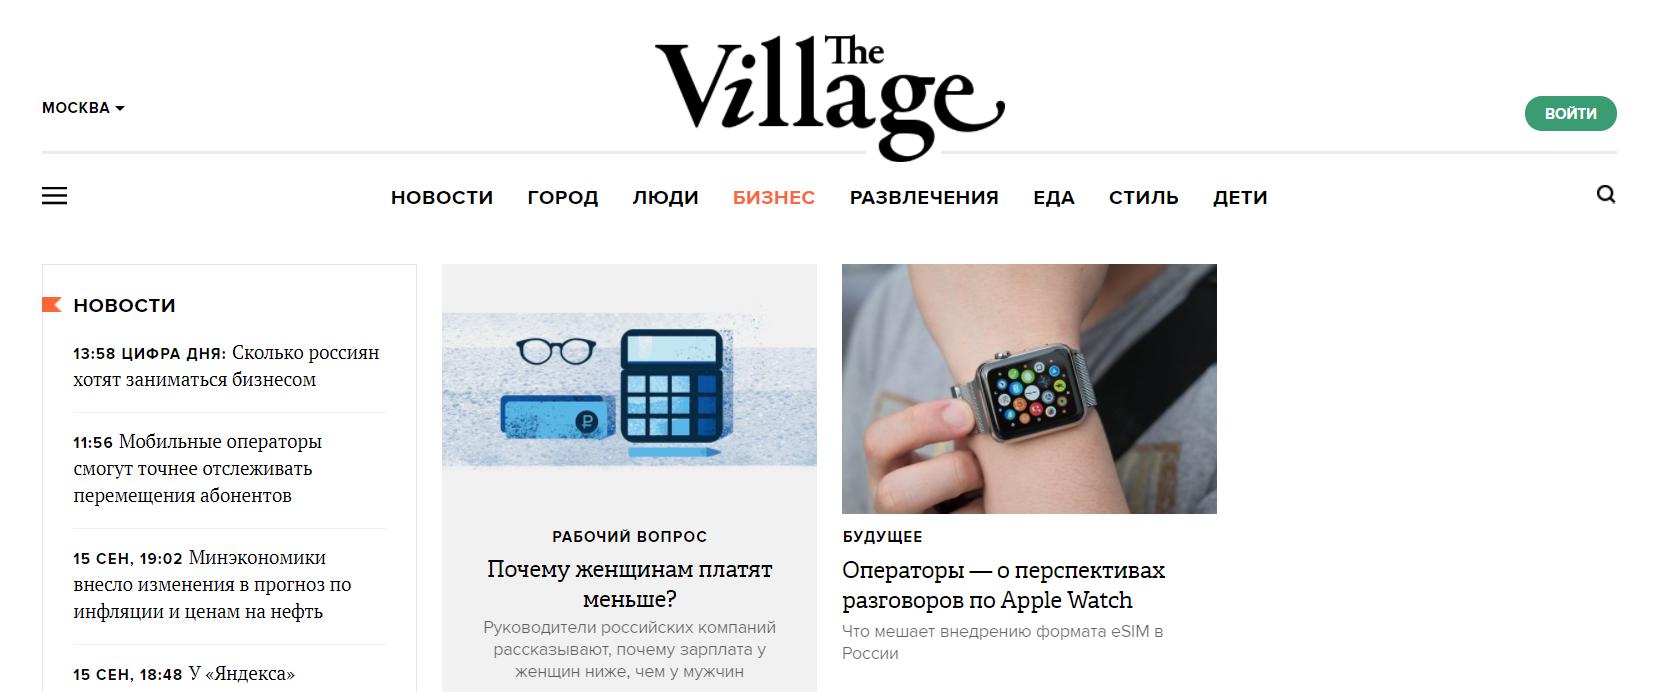 The Village о бизнесе